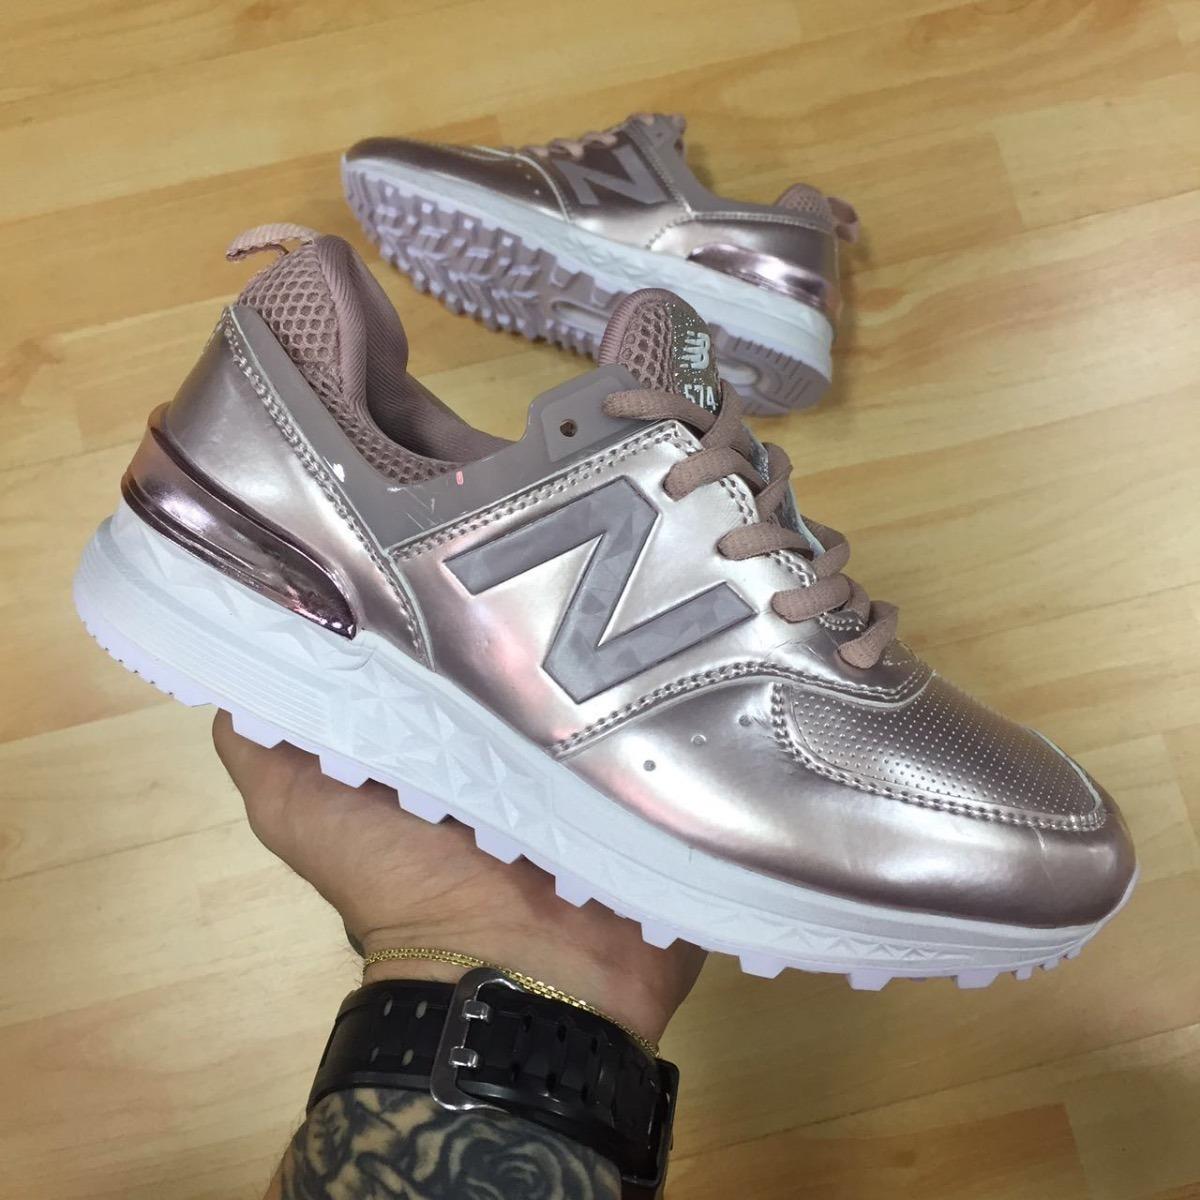 Tenis Zapatillas New Balance 530 Negra Blanca Mujer Env